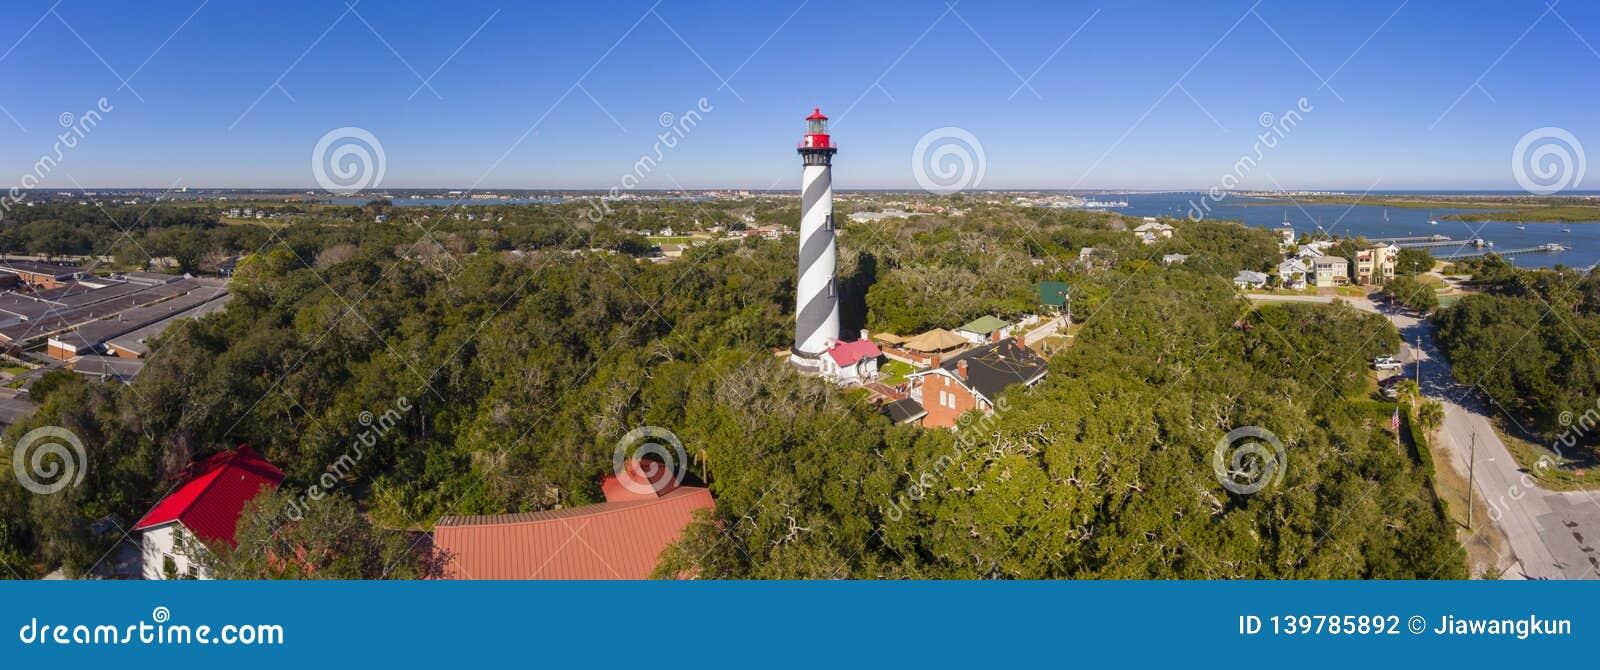 St. Augustine Lighthouse, Florida, USA